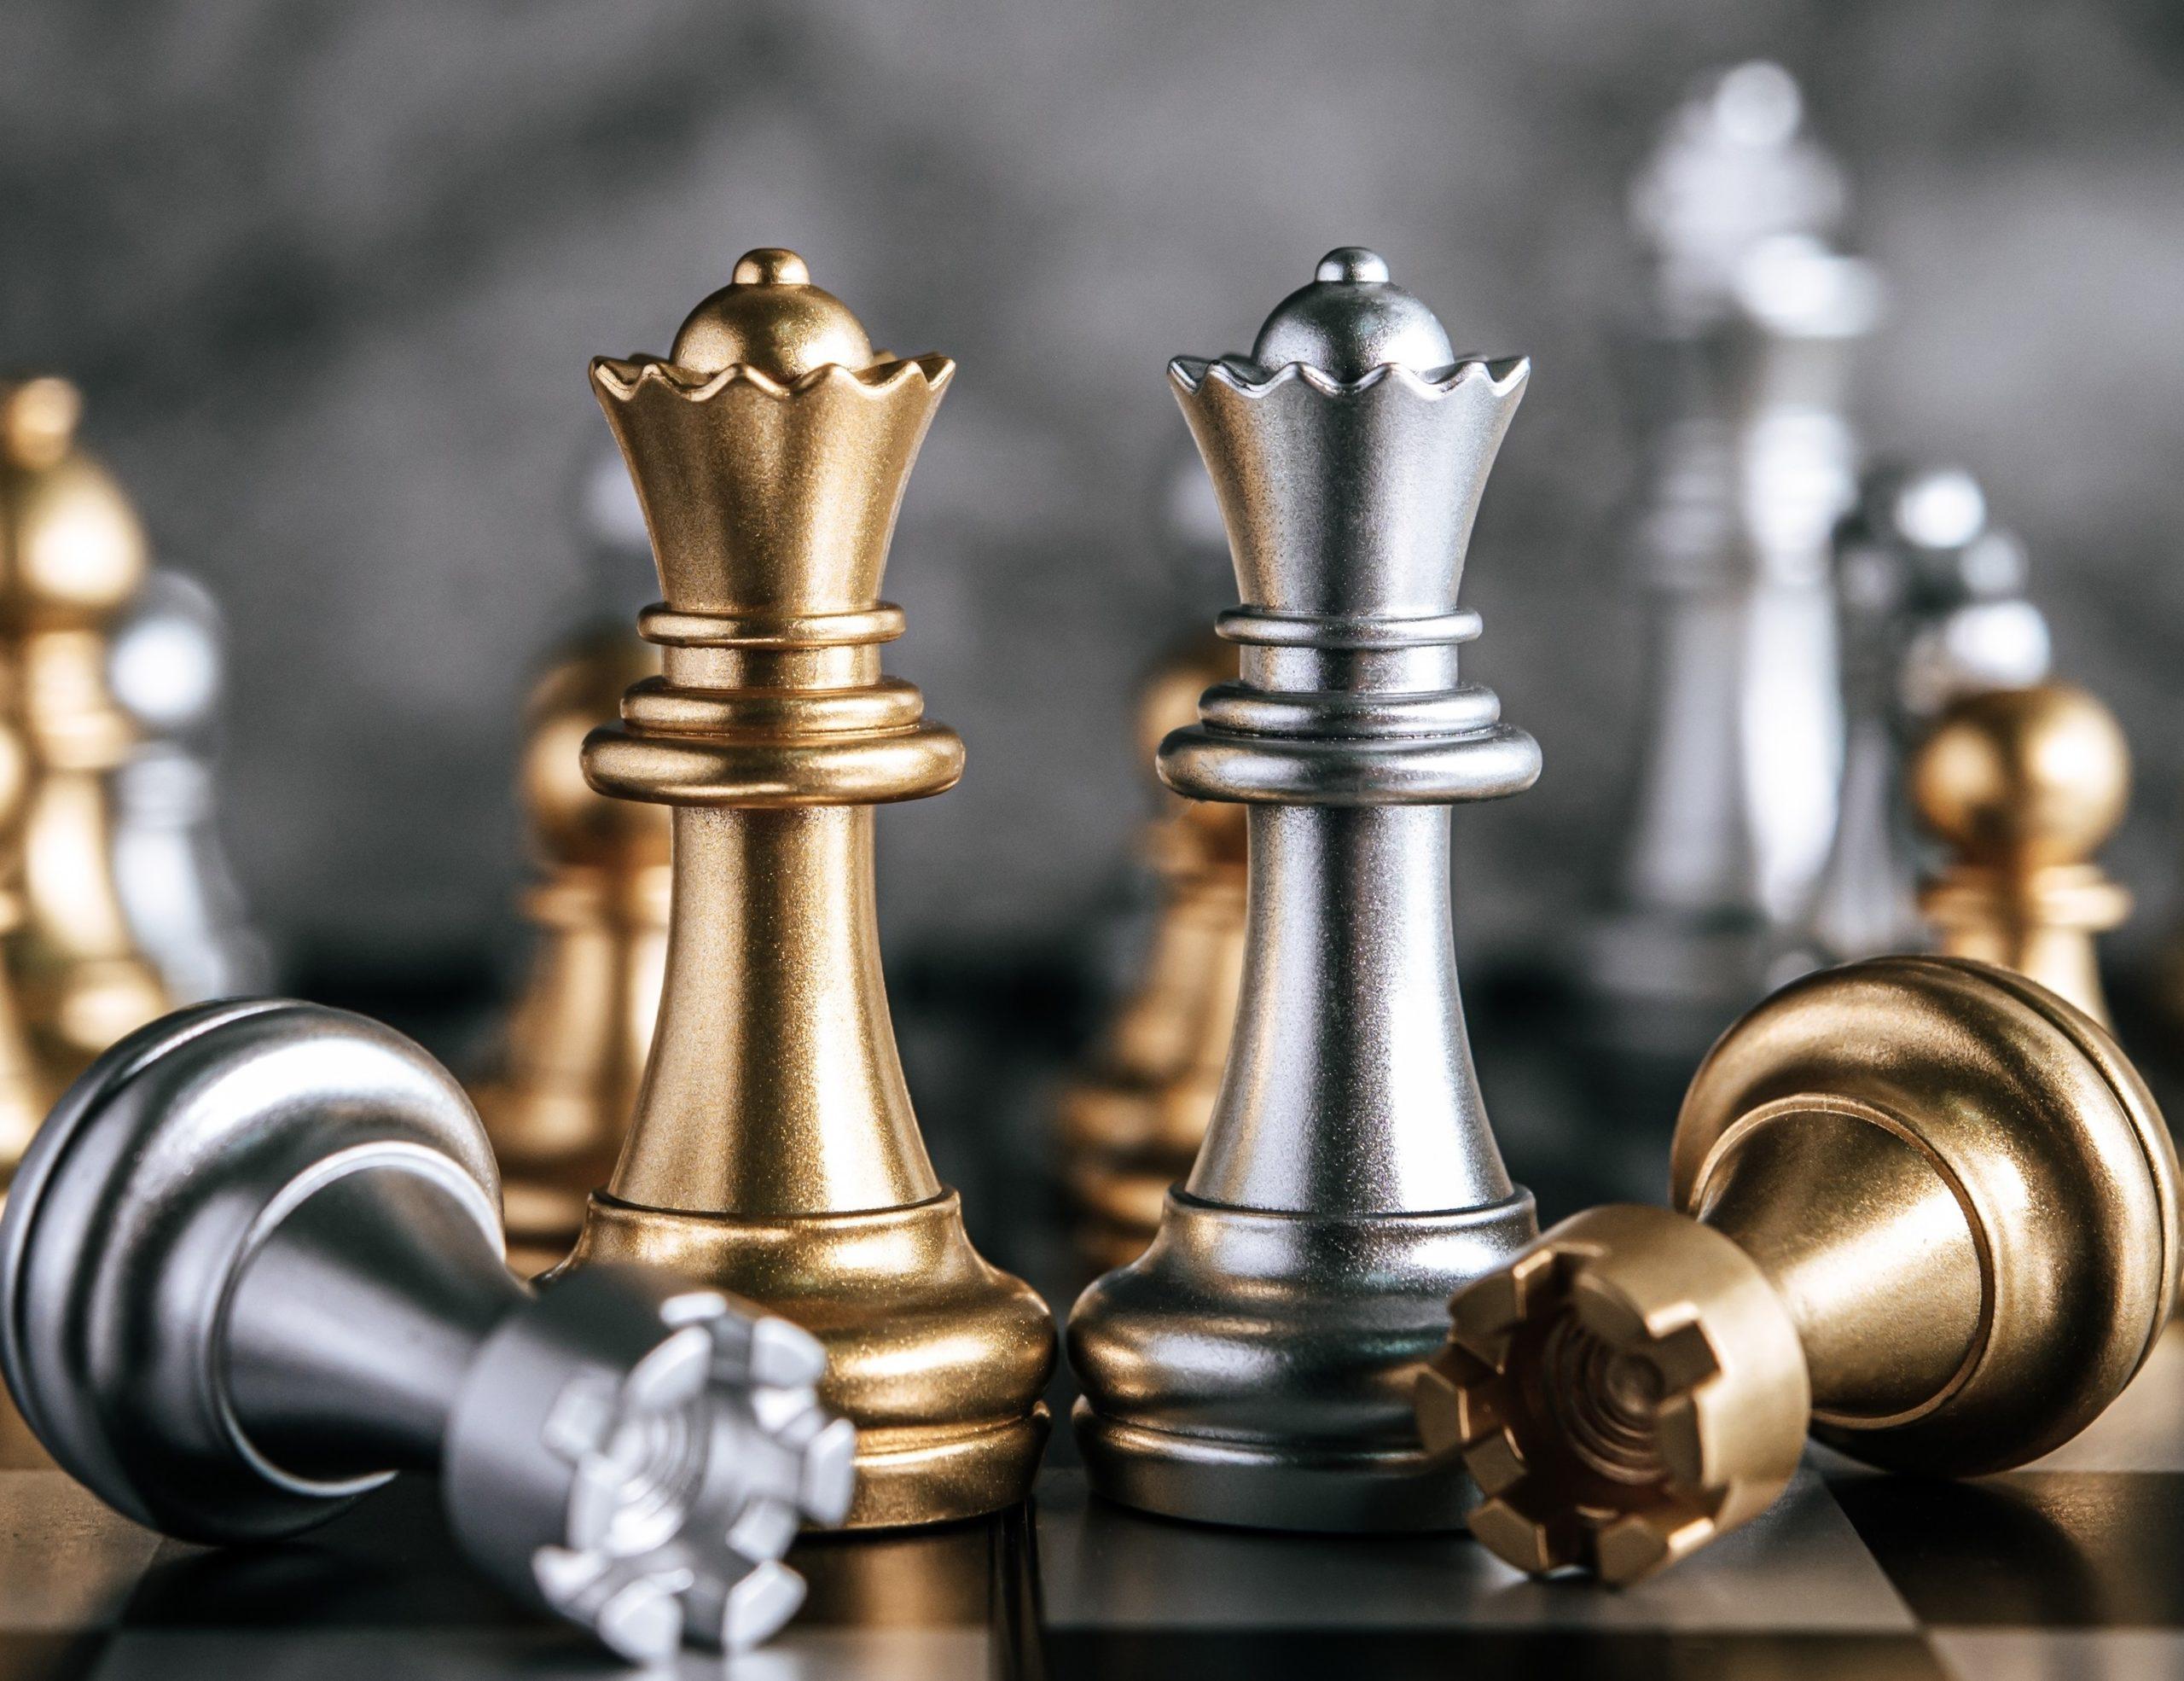 Joyas de oro o plata